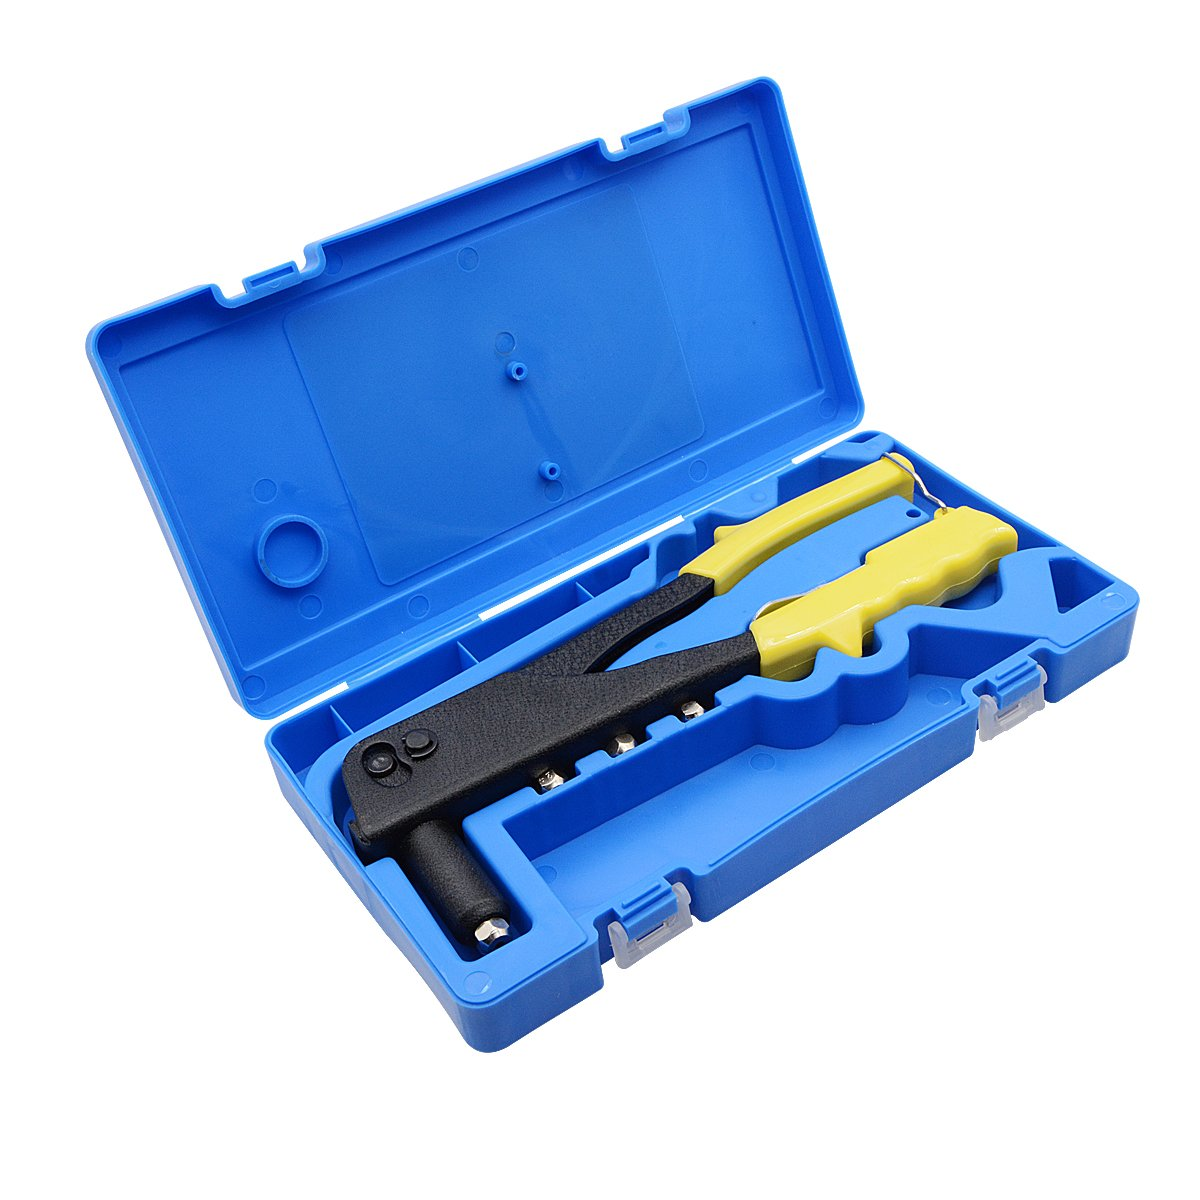 Penck Professional Pop Rivet Gun Kit, Hand Repair Tools Riveter, Heavy Duty Hand Riveter Set for Sheet Metal, Automotive and Duct Work(100 PCS Metal Rivets Included) by Penck (Image #5)